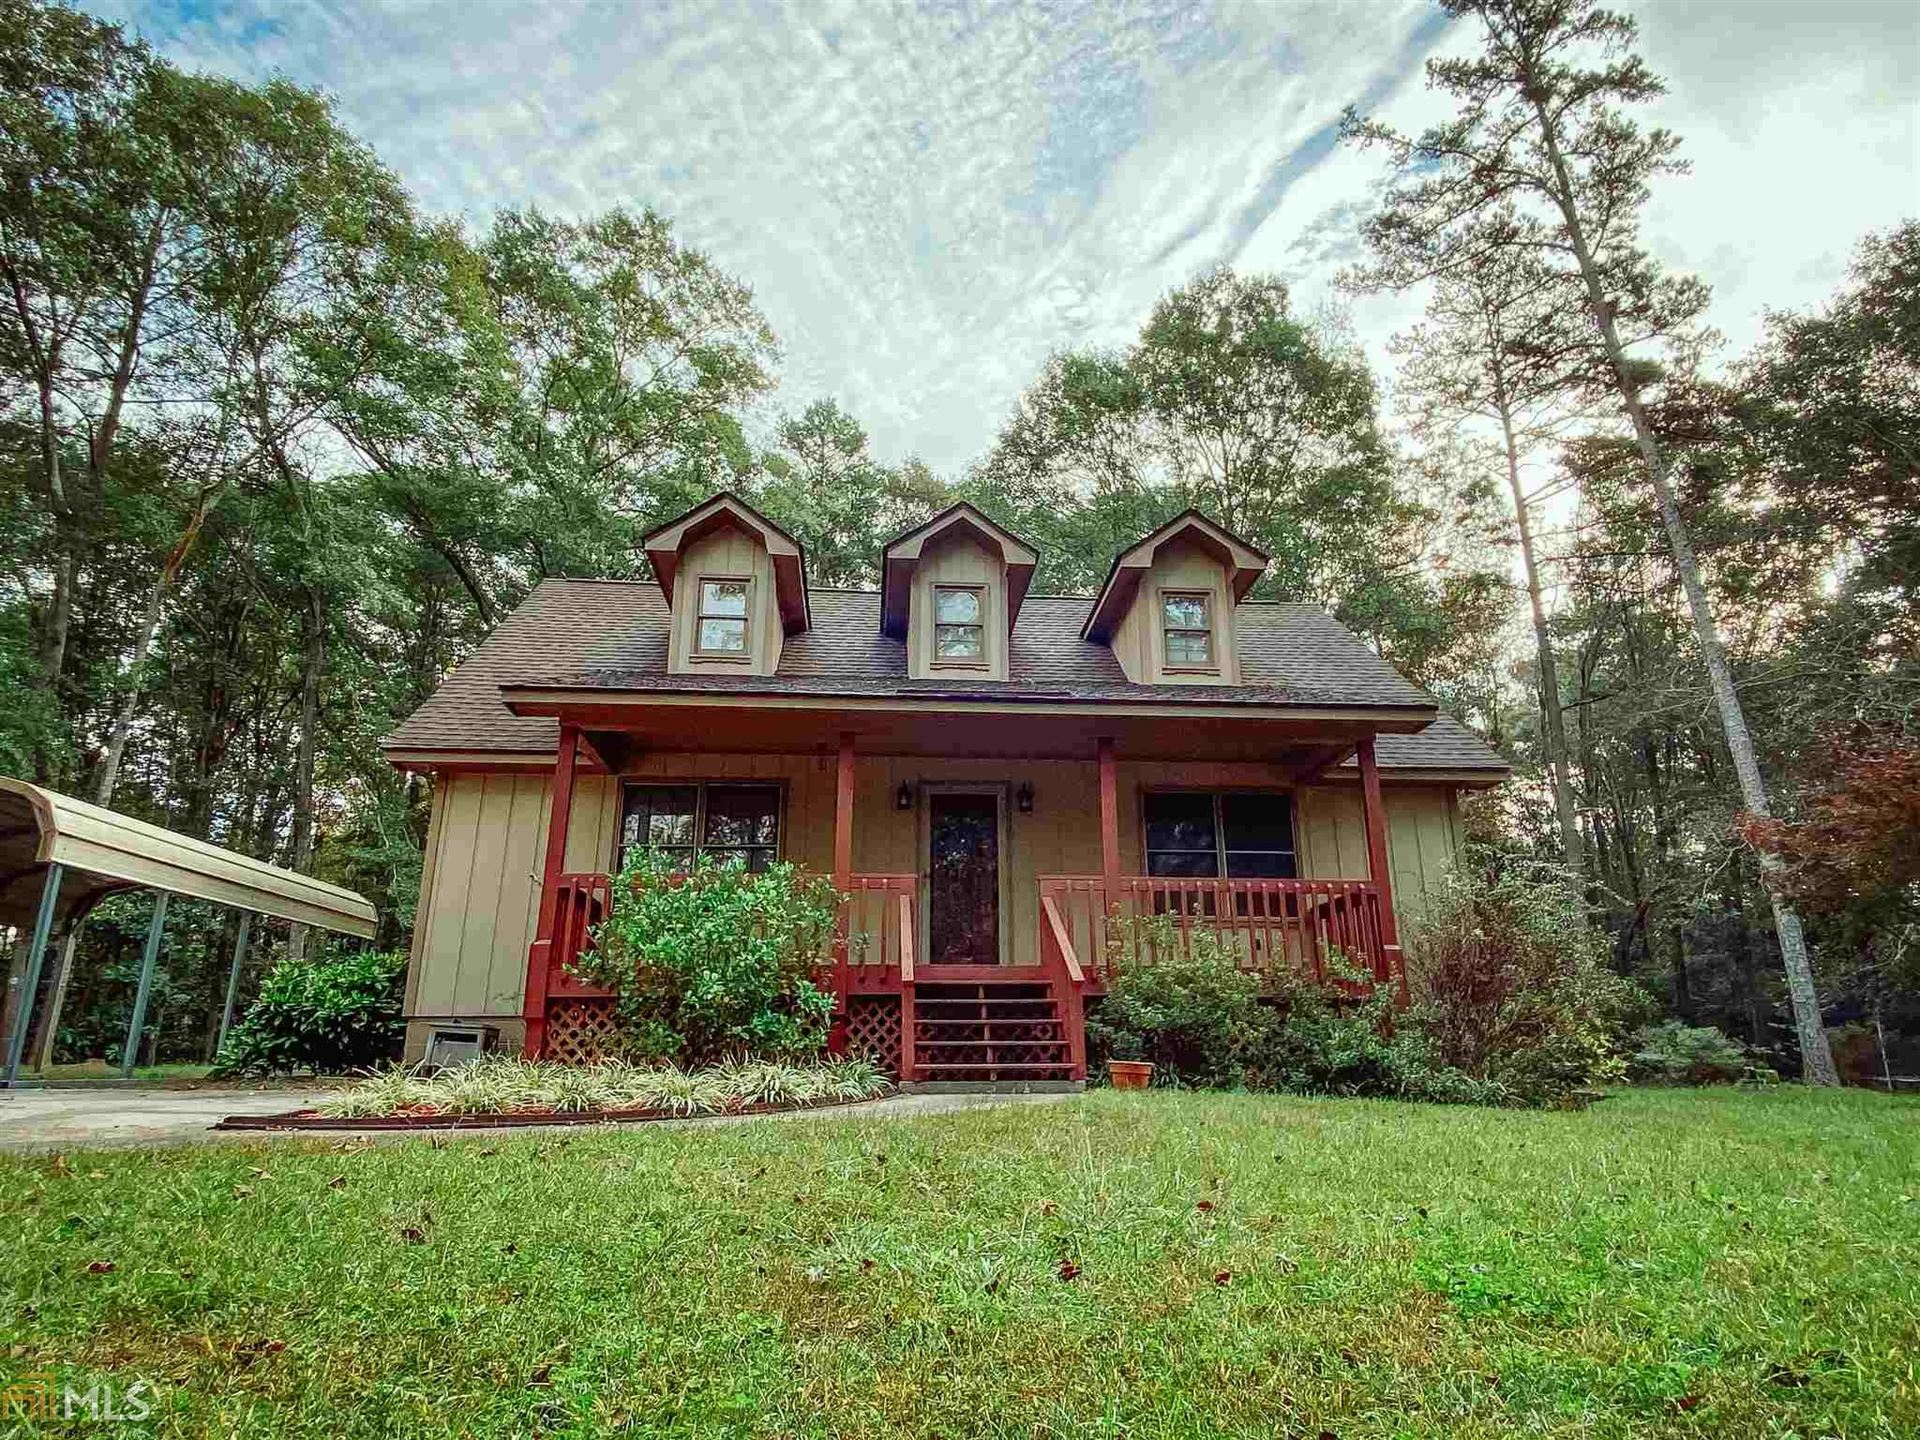 128 Old Park Rd, Lavonia, GA 30553 - MLS#: 8877160